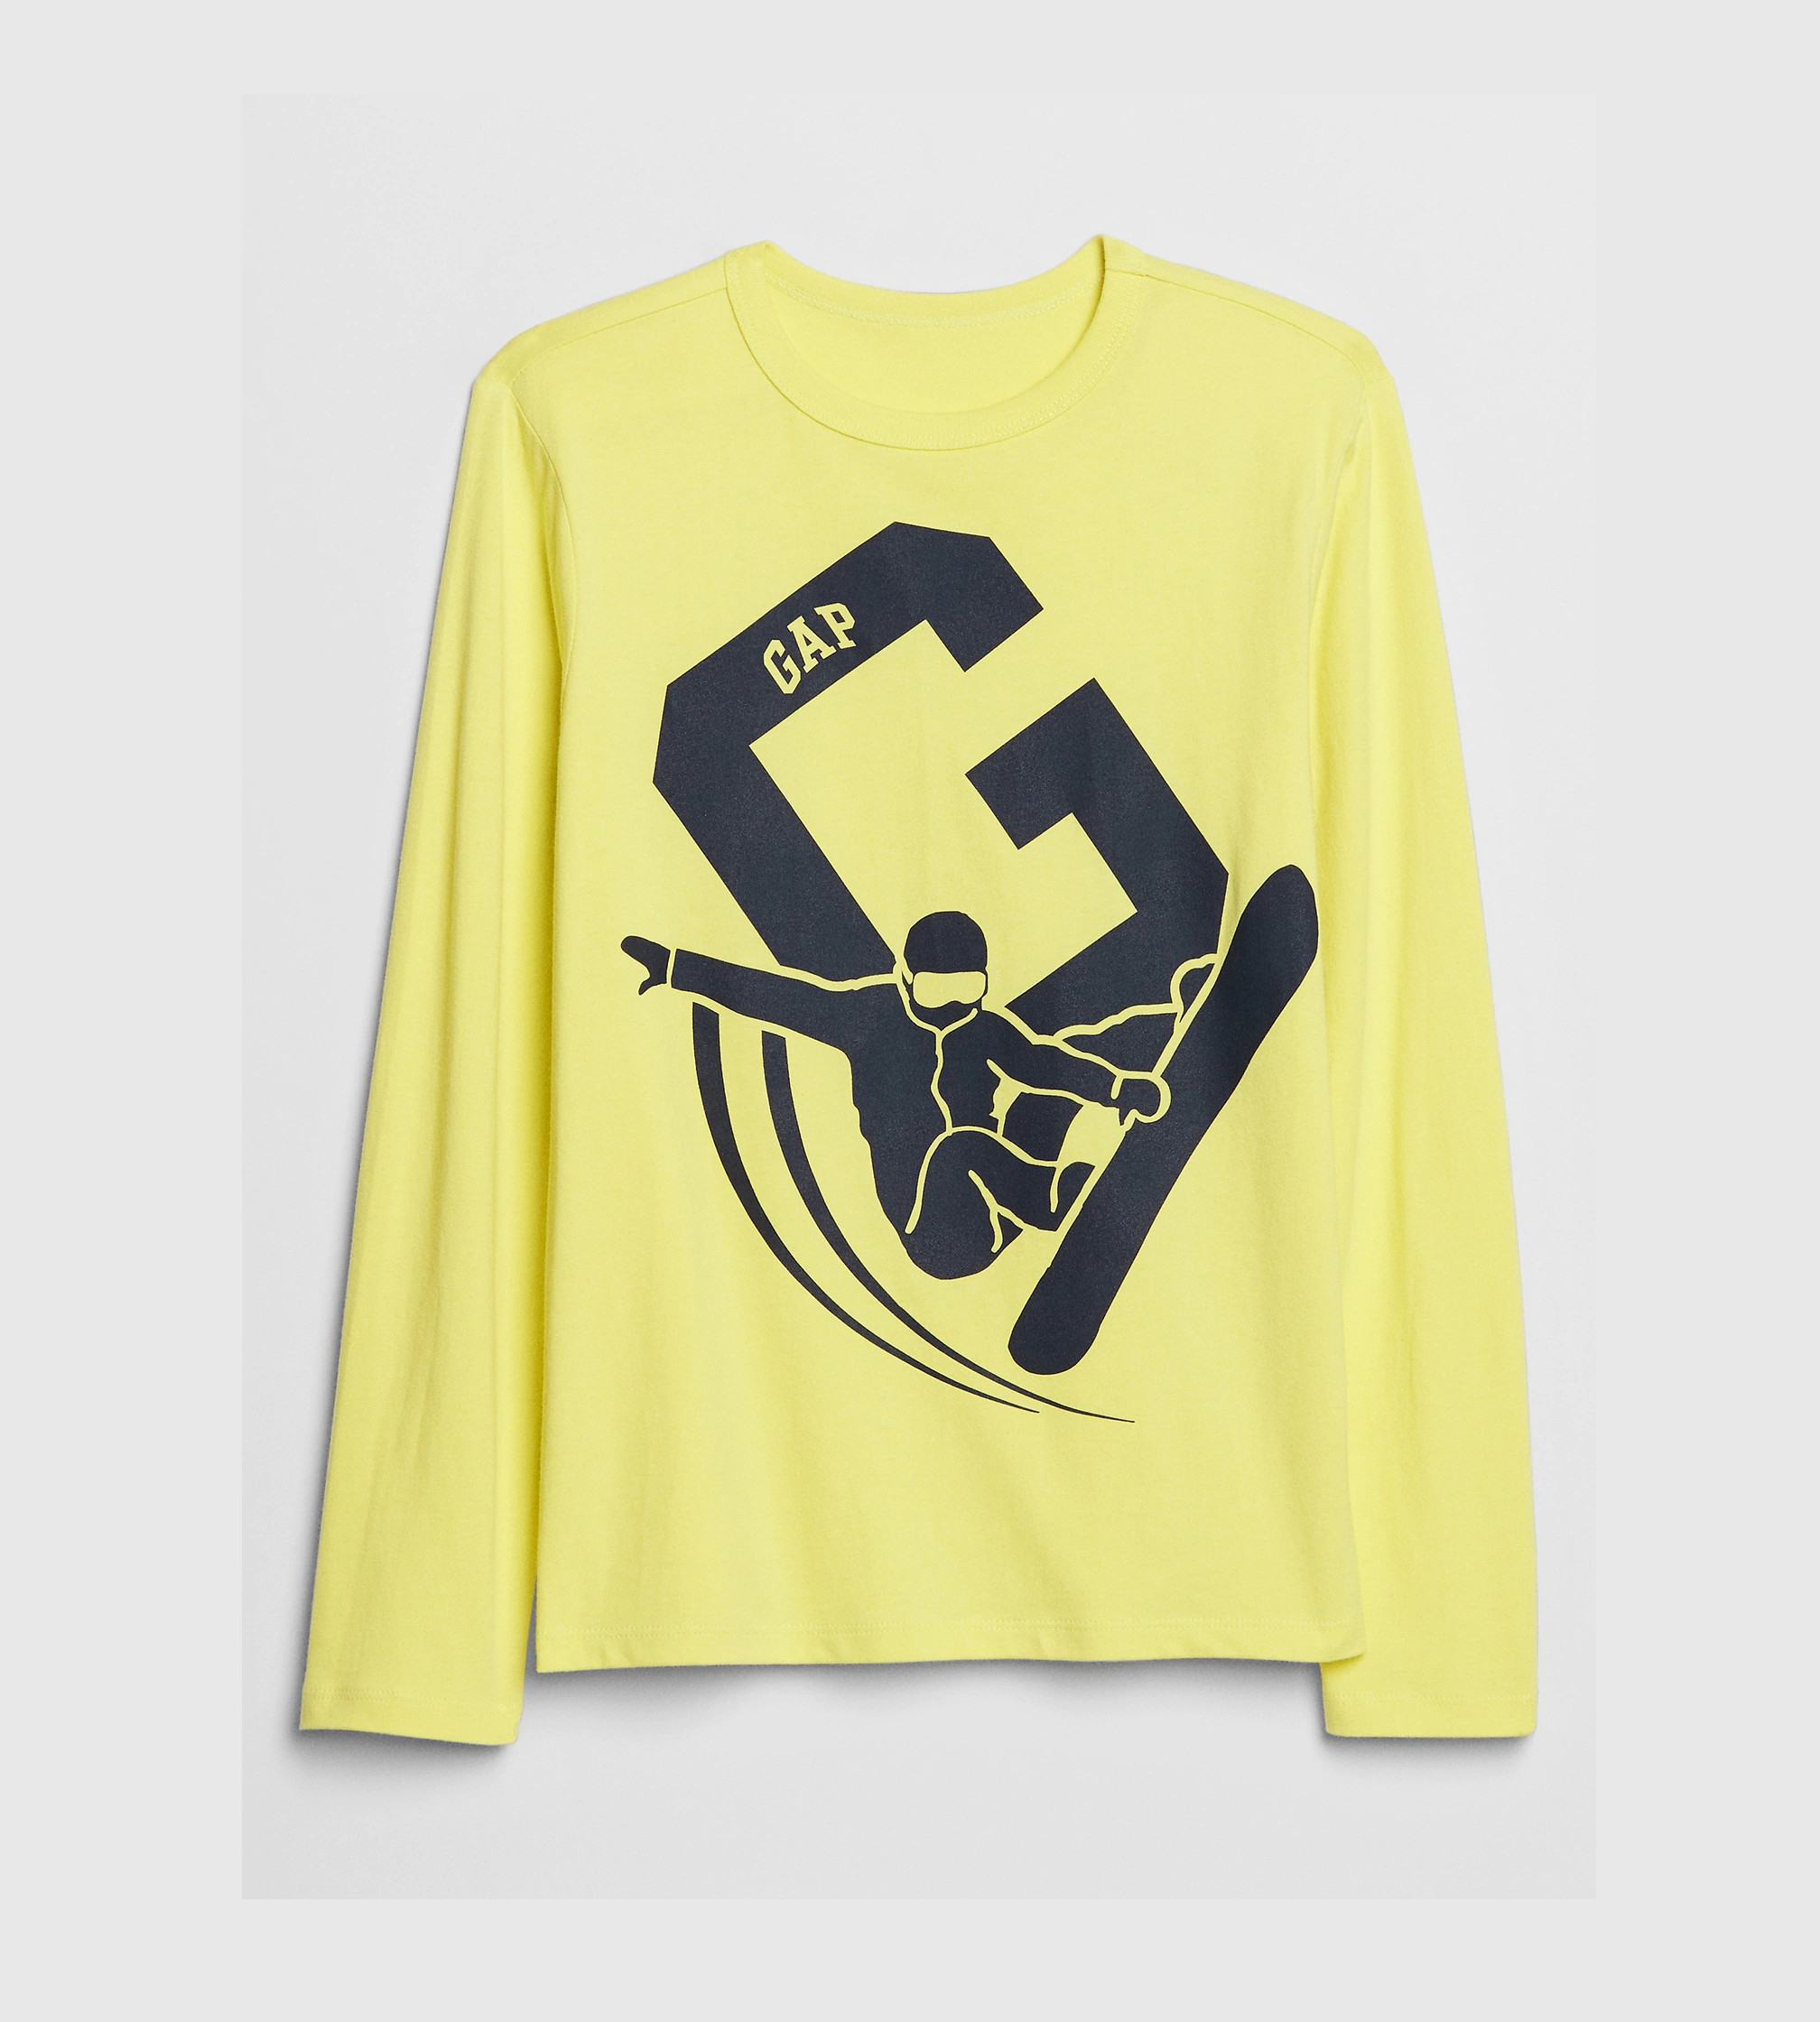 Купити Реглан Gap Скейтборд Graphic T-Shirt: shooting star yellow - фото 1